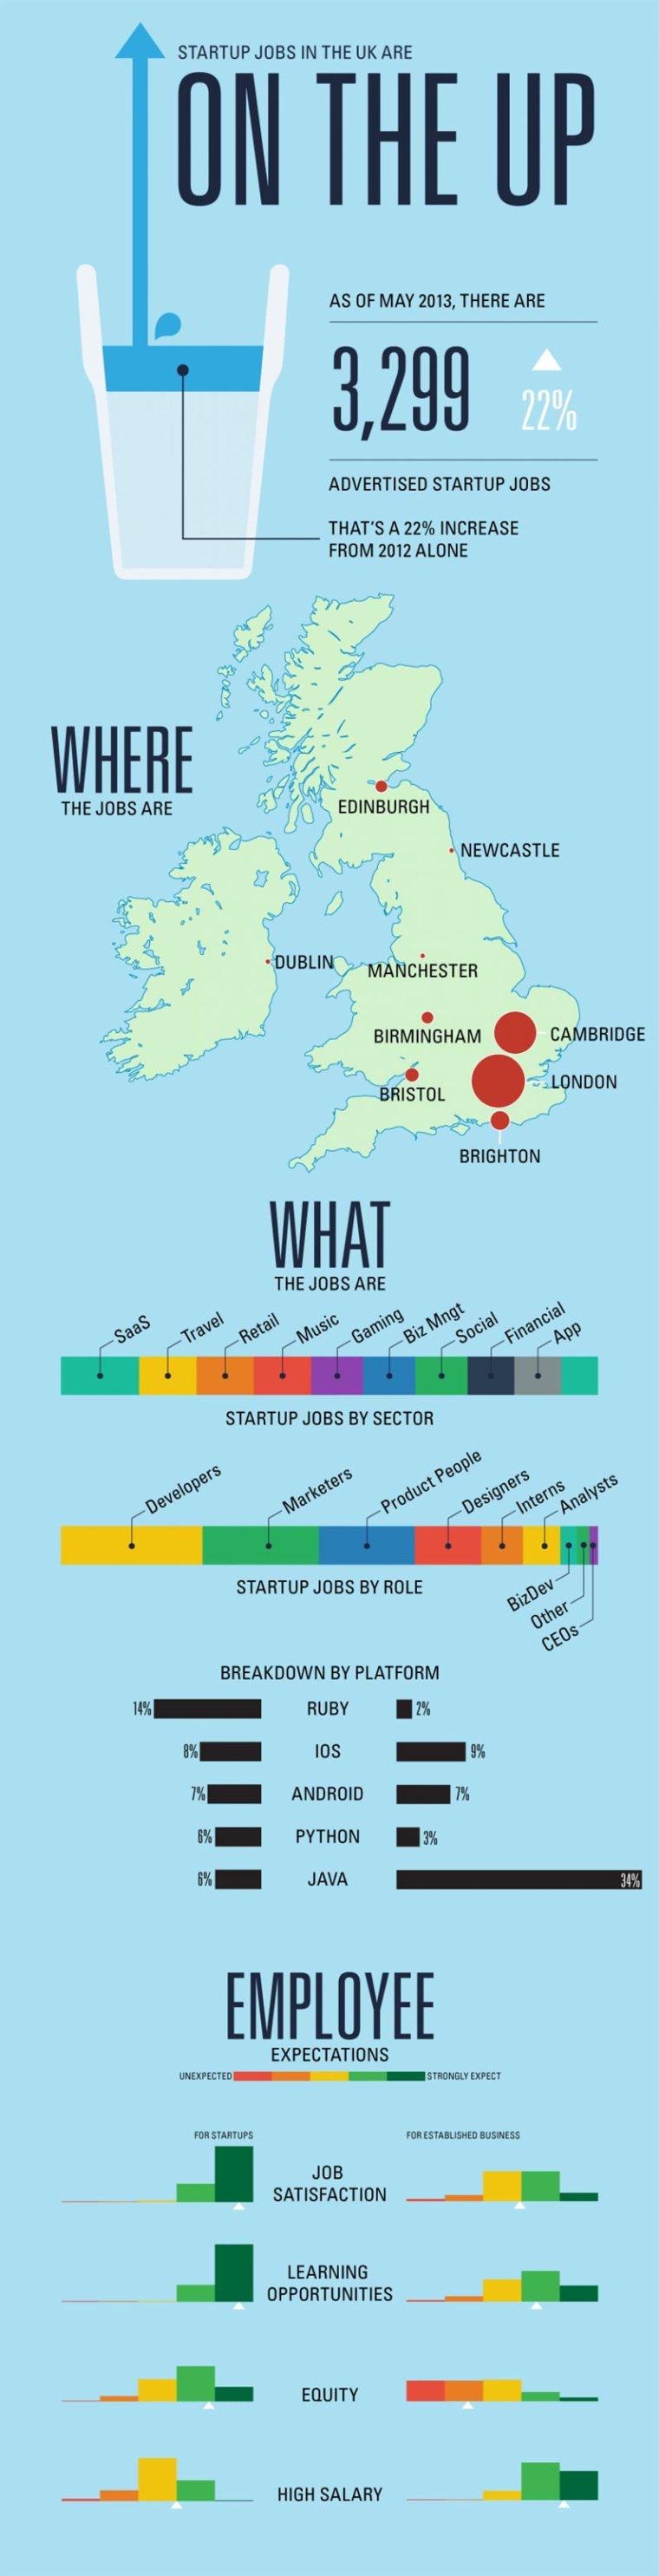 UK startup job trends infographic